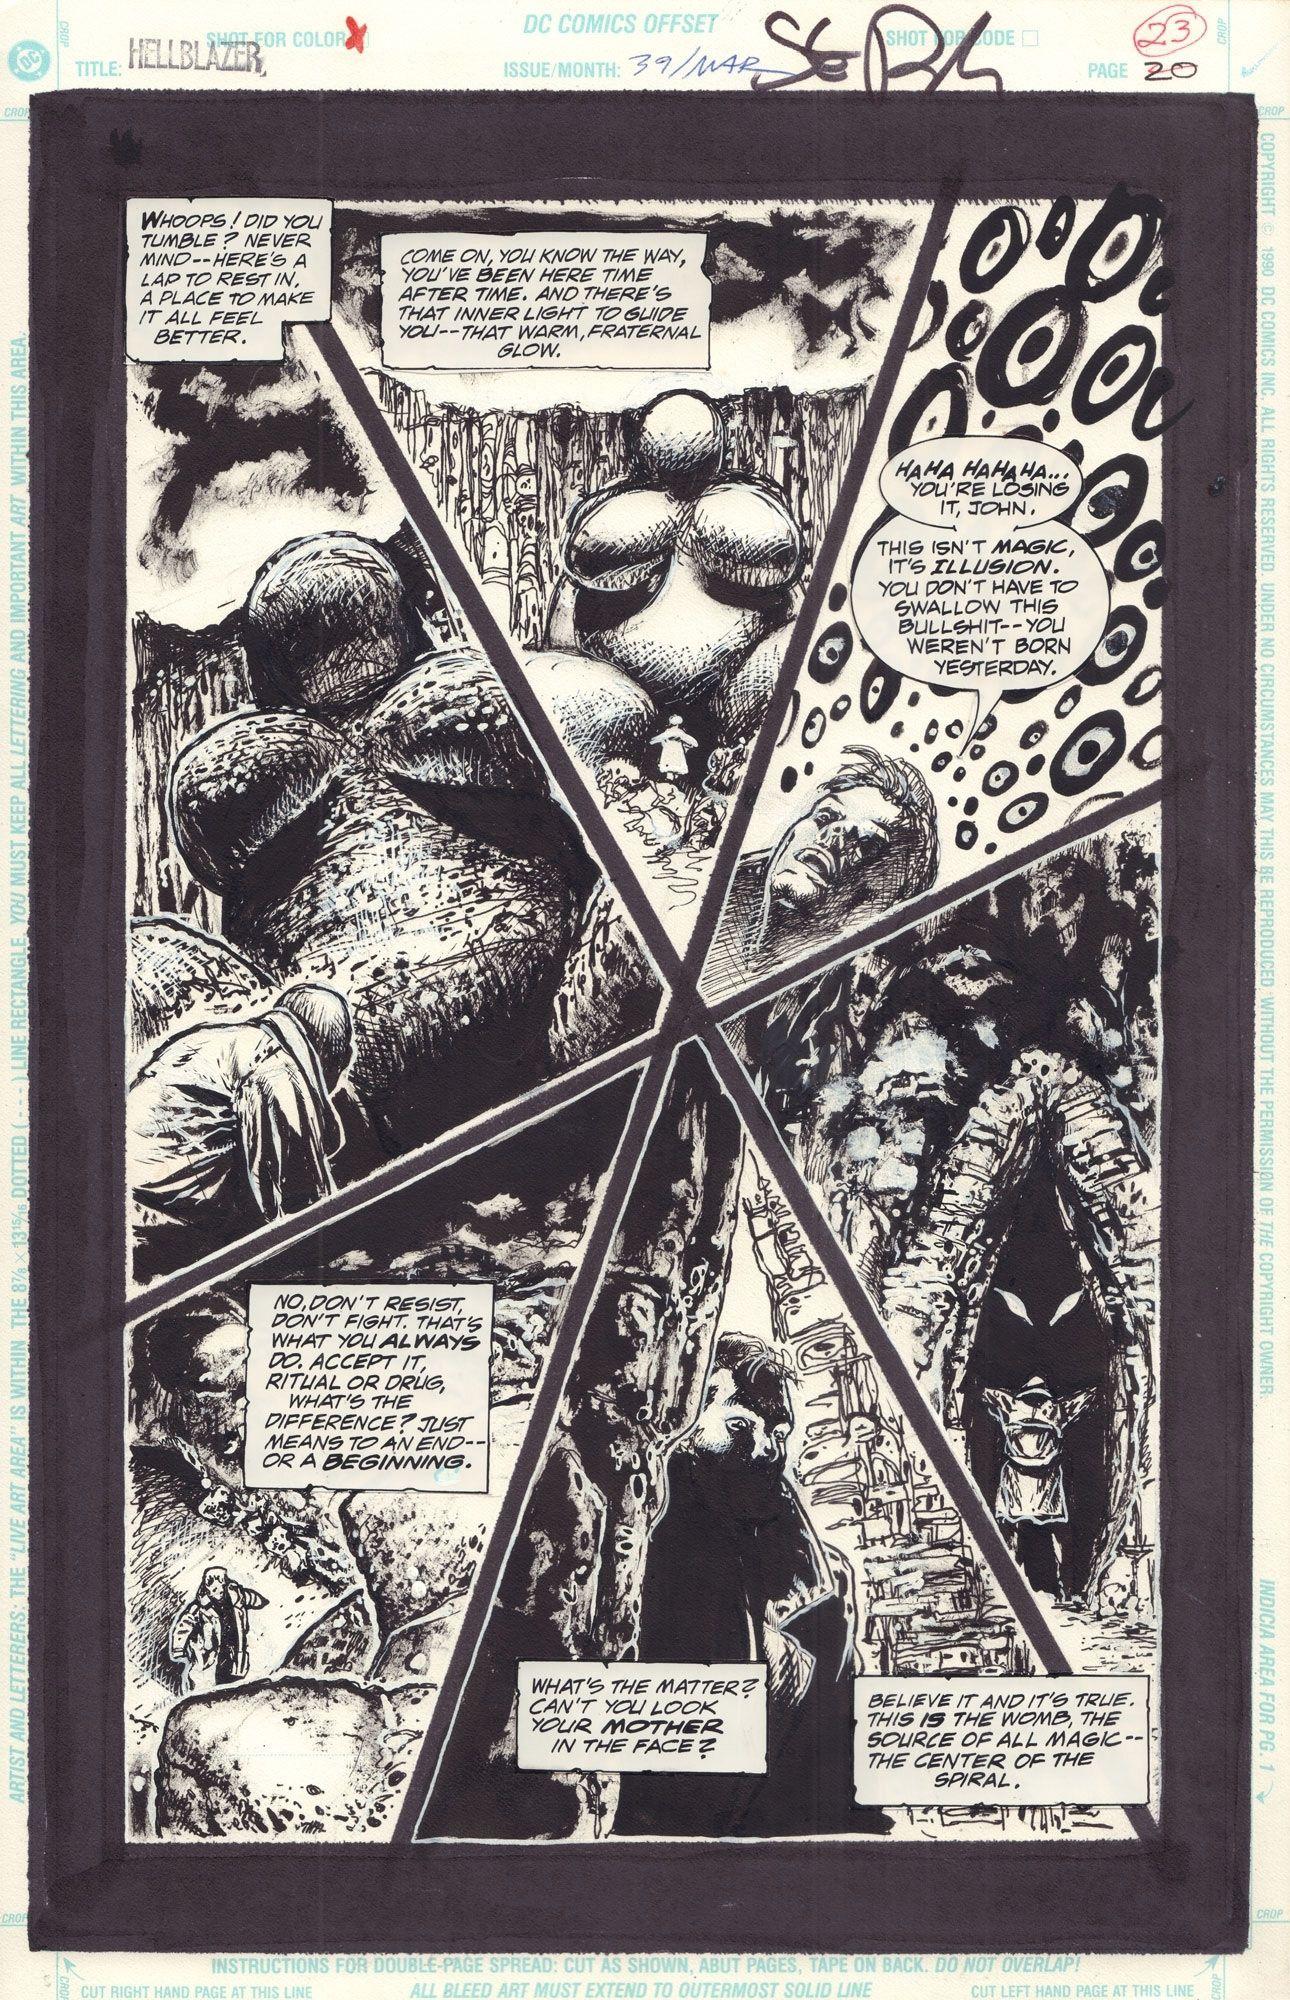 Hellblazer #39 / 20